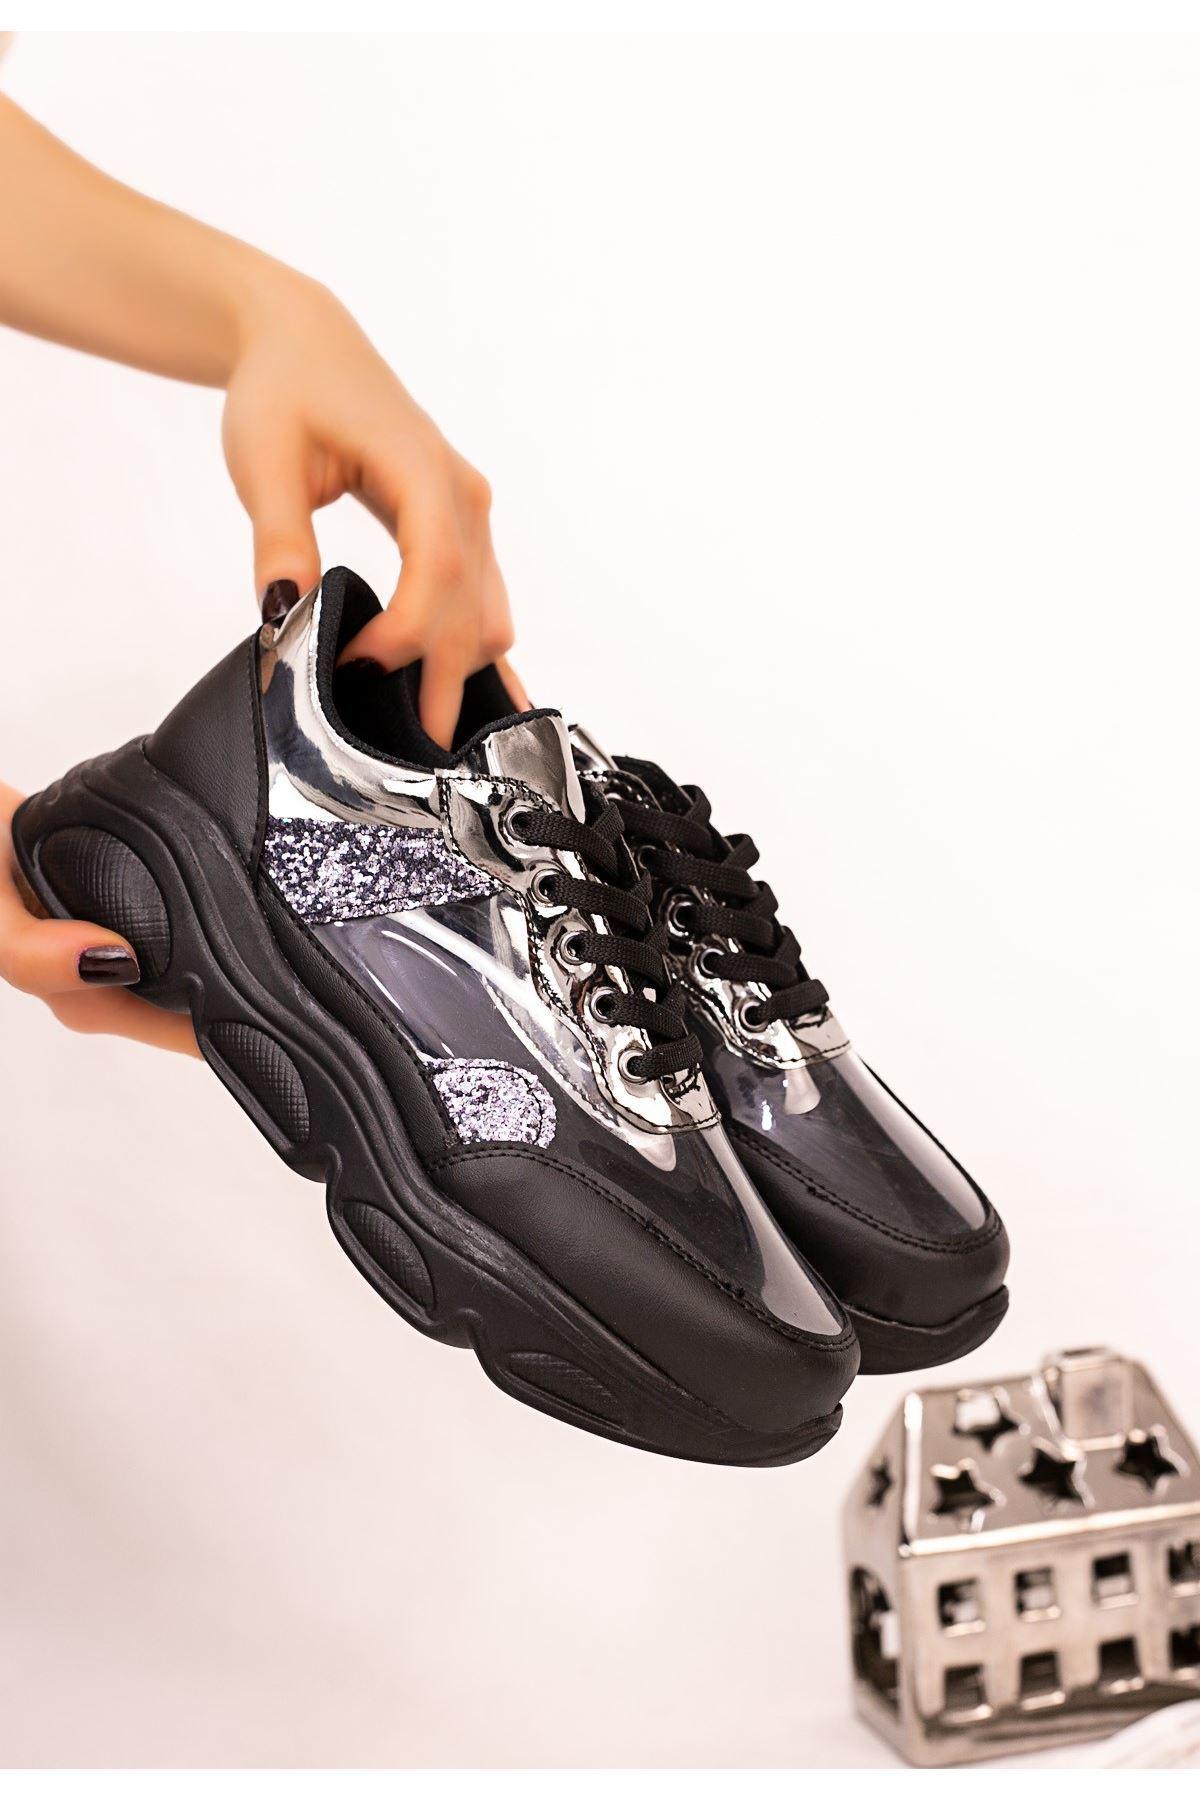 Tonix Siyah Cilt Platin Simli Spor Ayakkabı